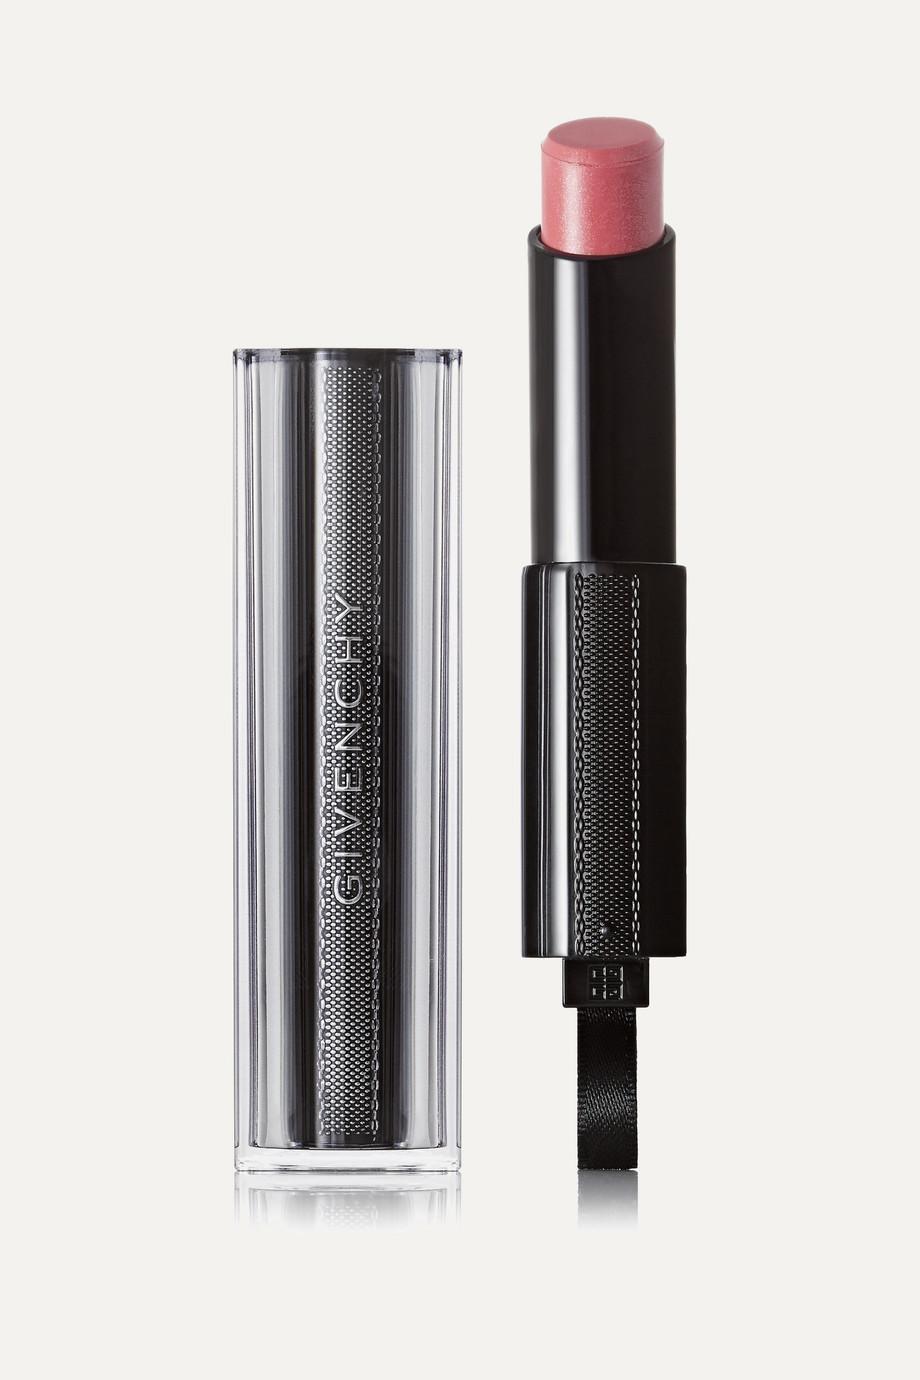 Rouge Interdit Vinyl Lipstick - Rose Mutin No. 03, by Givenchy Beauty